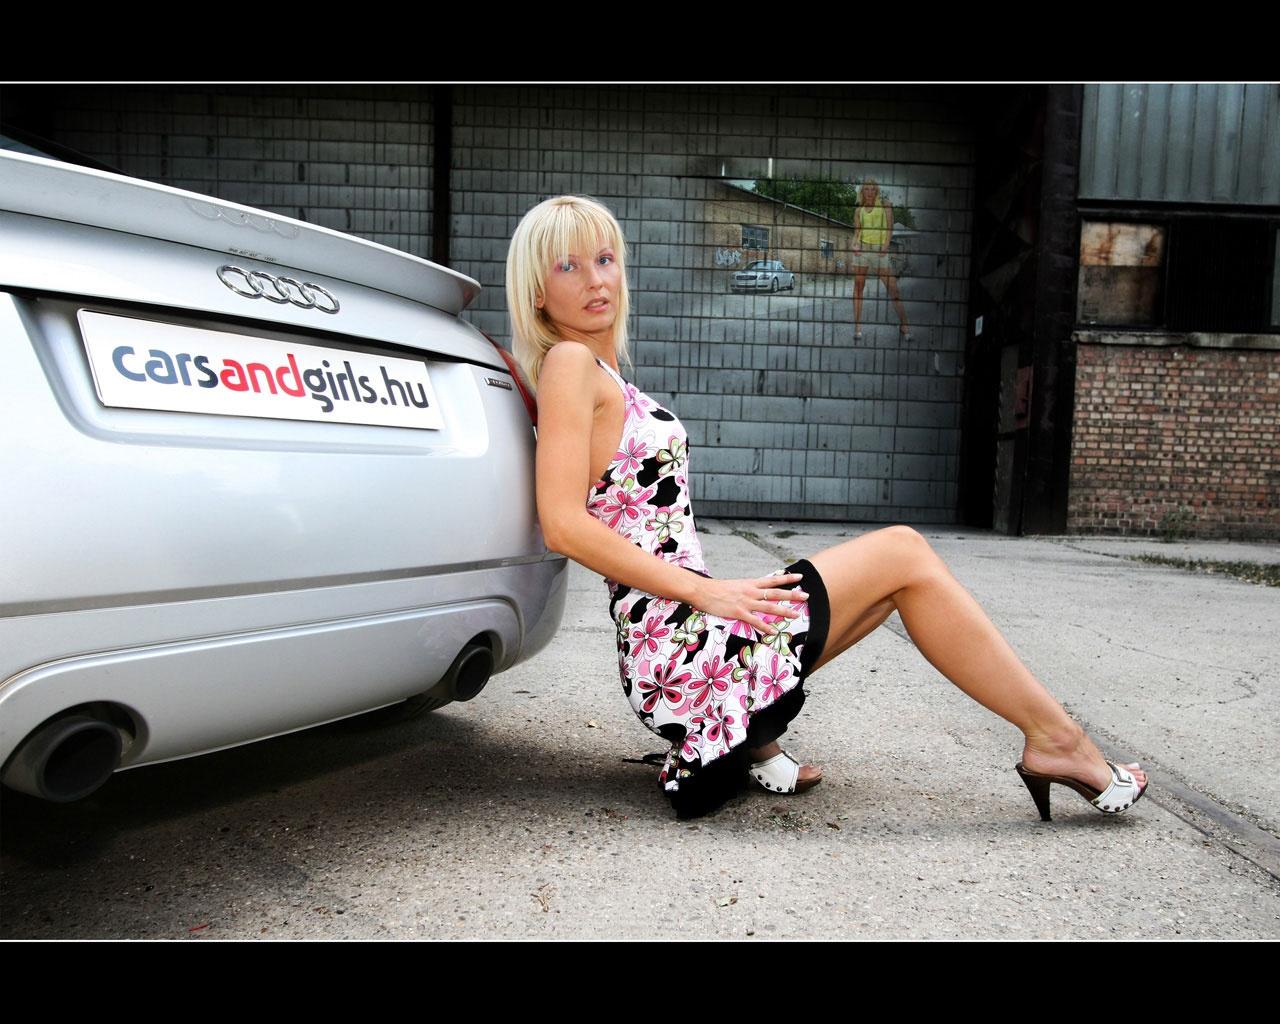 High Adrenalin: car and sexy girl wallpaper